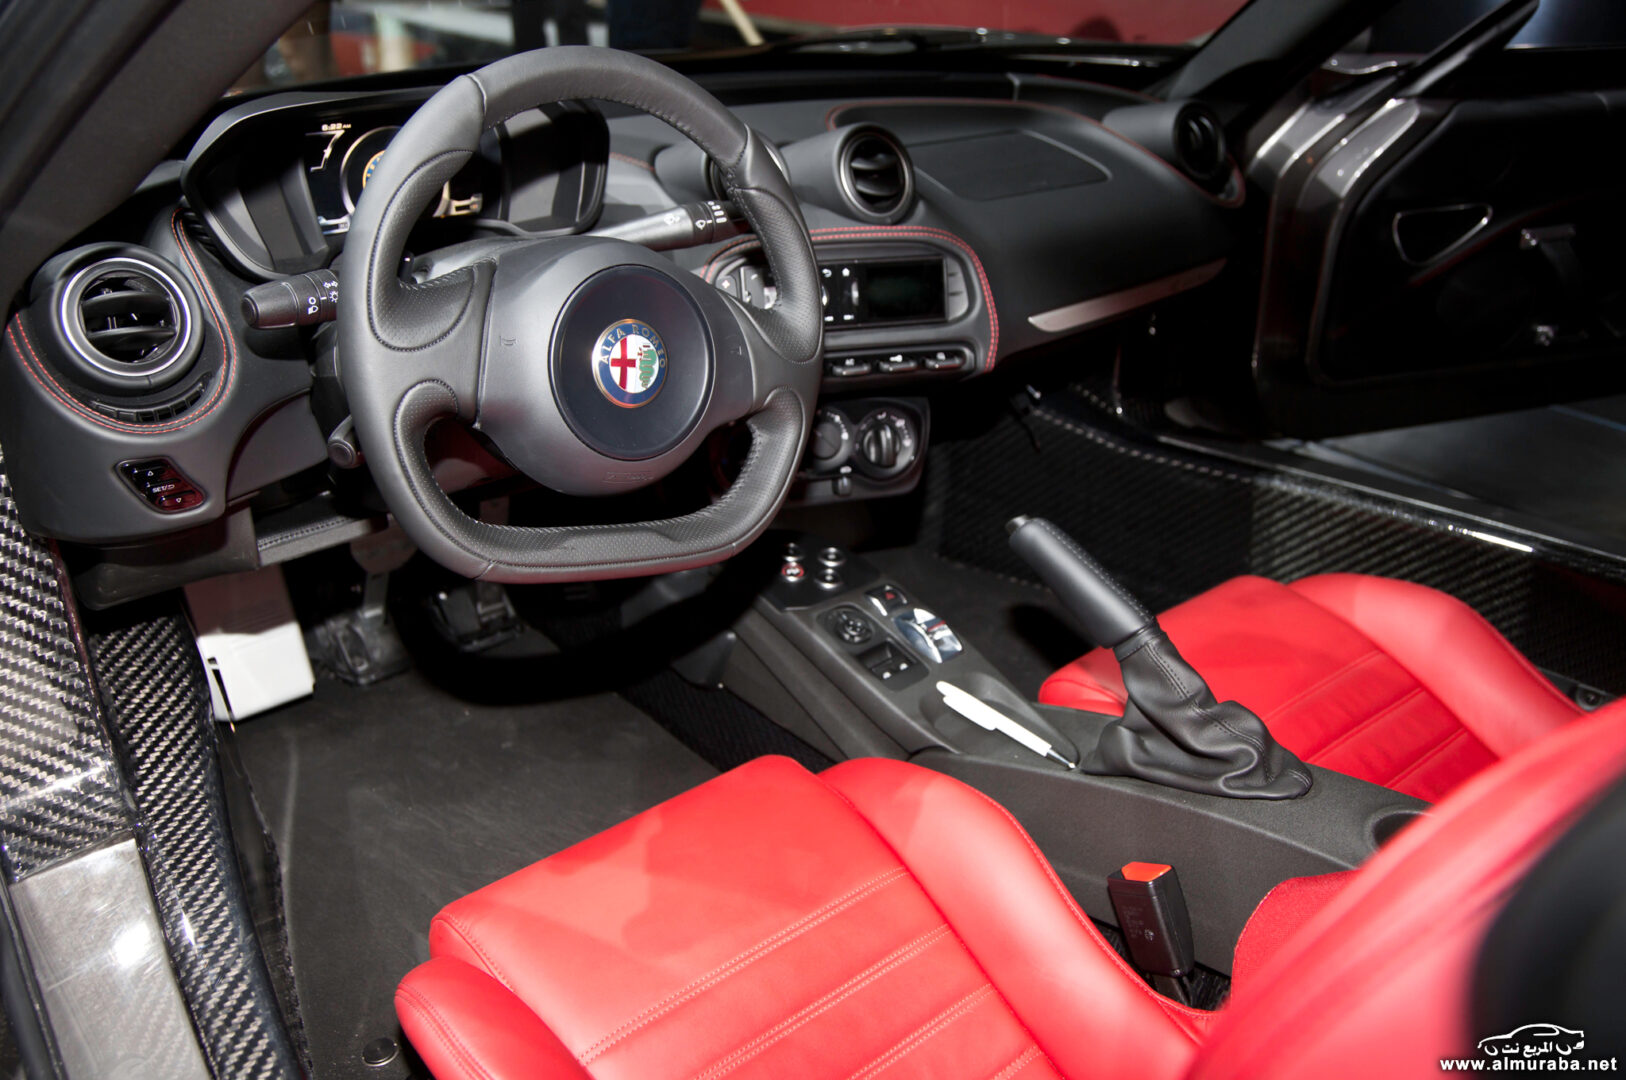 http---image.motortrend.com-f-wot-1404_2015_alfa_romeo_4c_launch_edition_arrives_this_june-72848109-2015-Alfa-Romeo-4C-Launch-Edition-interior-02